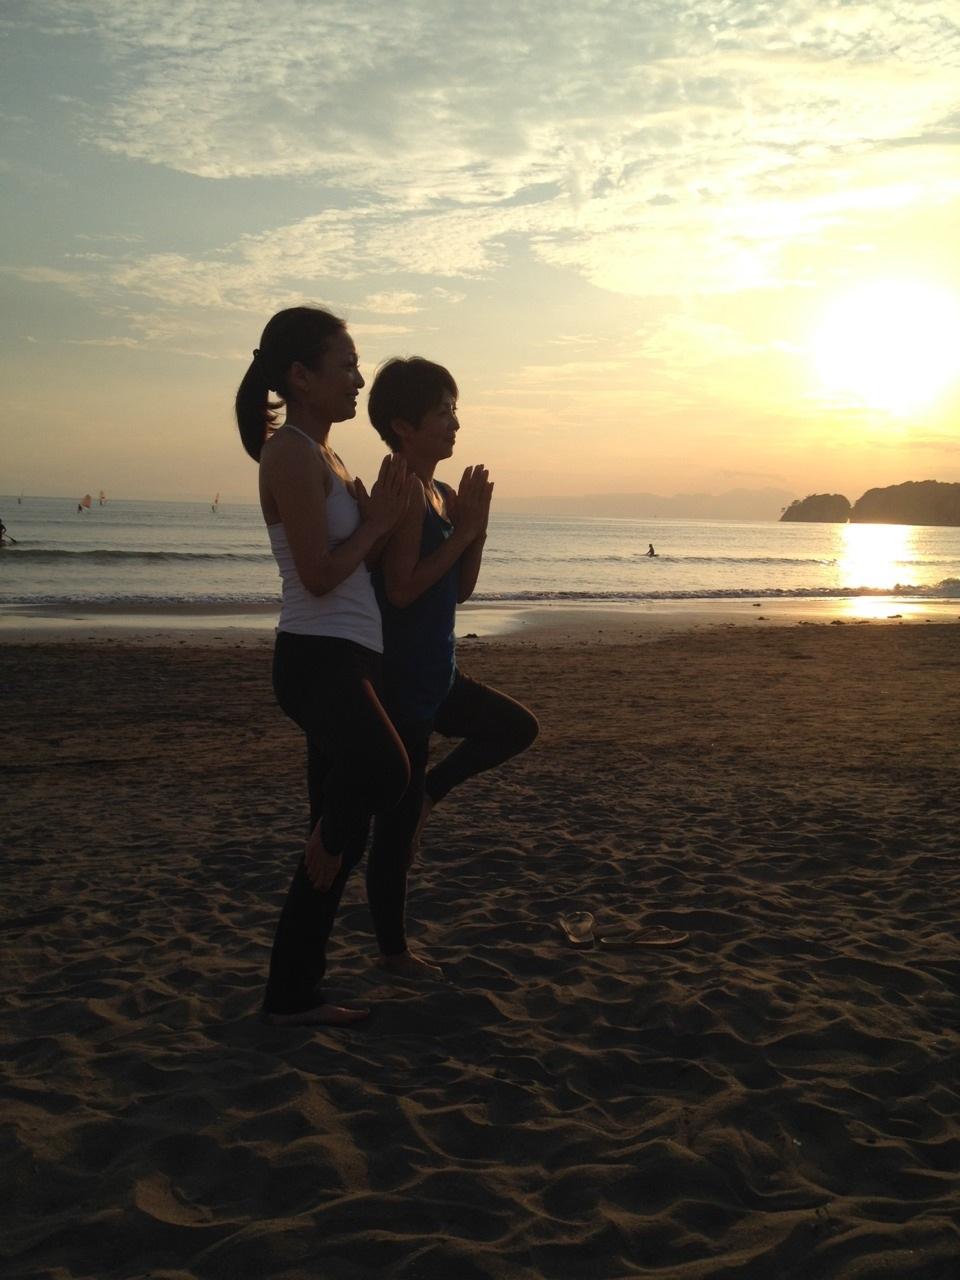 Beach yoga らぶ♥_a0267845_19575557.jpg